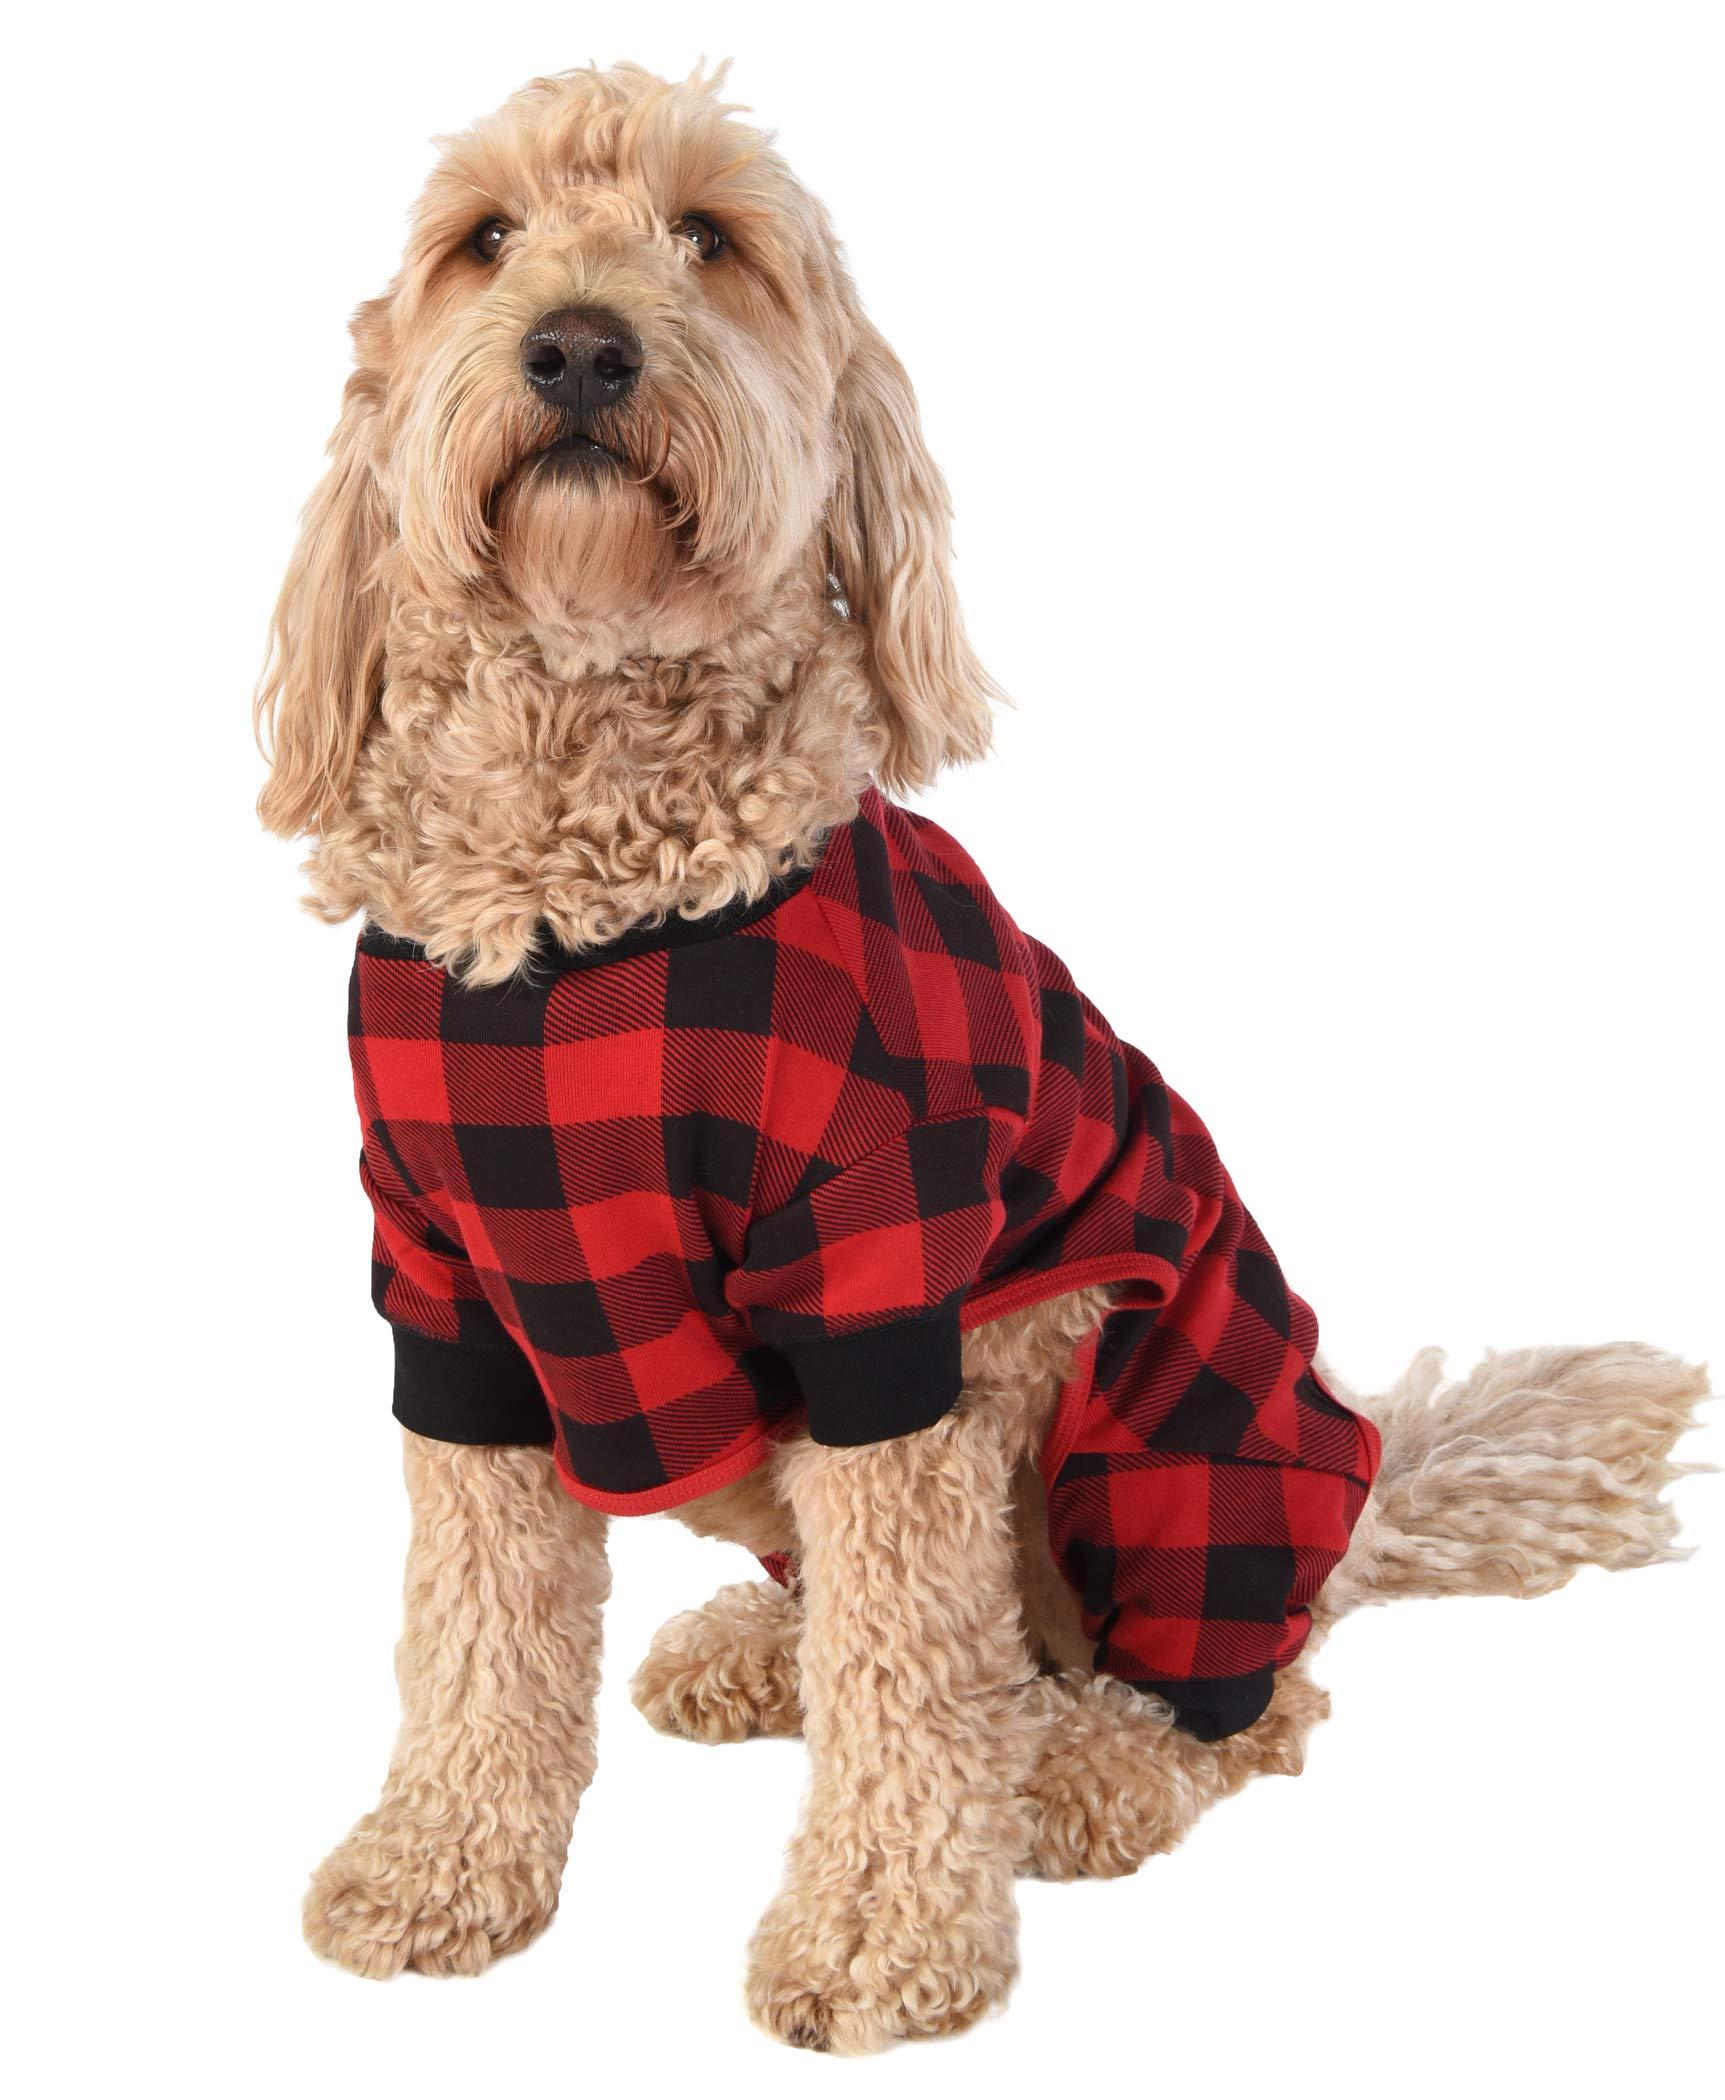 Plaid Bear Cheeks Flapjacks Dog Flapjack Onsie Sweater by LazyOne | Adult Kid Infant Dog Family Matching Pajamas (Large)